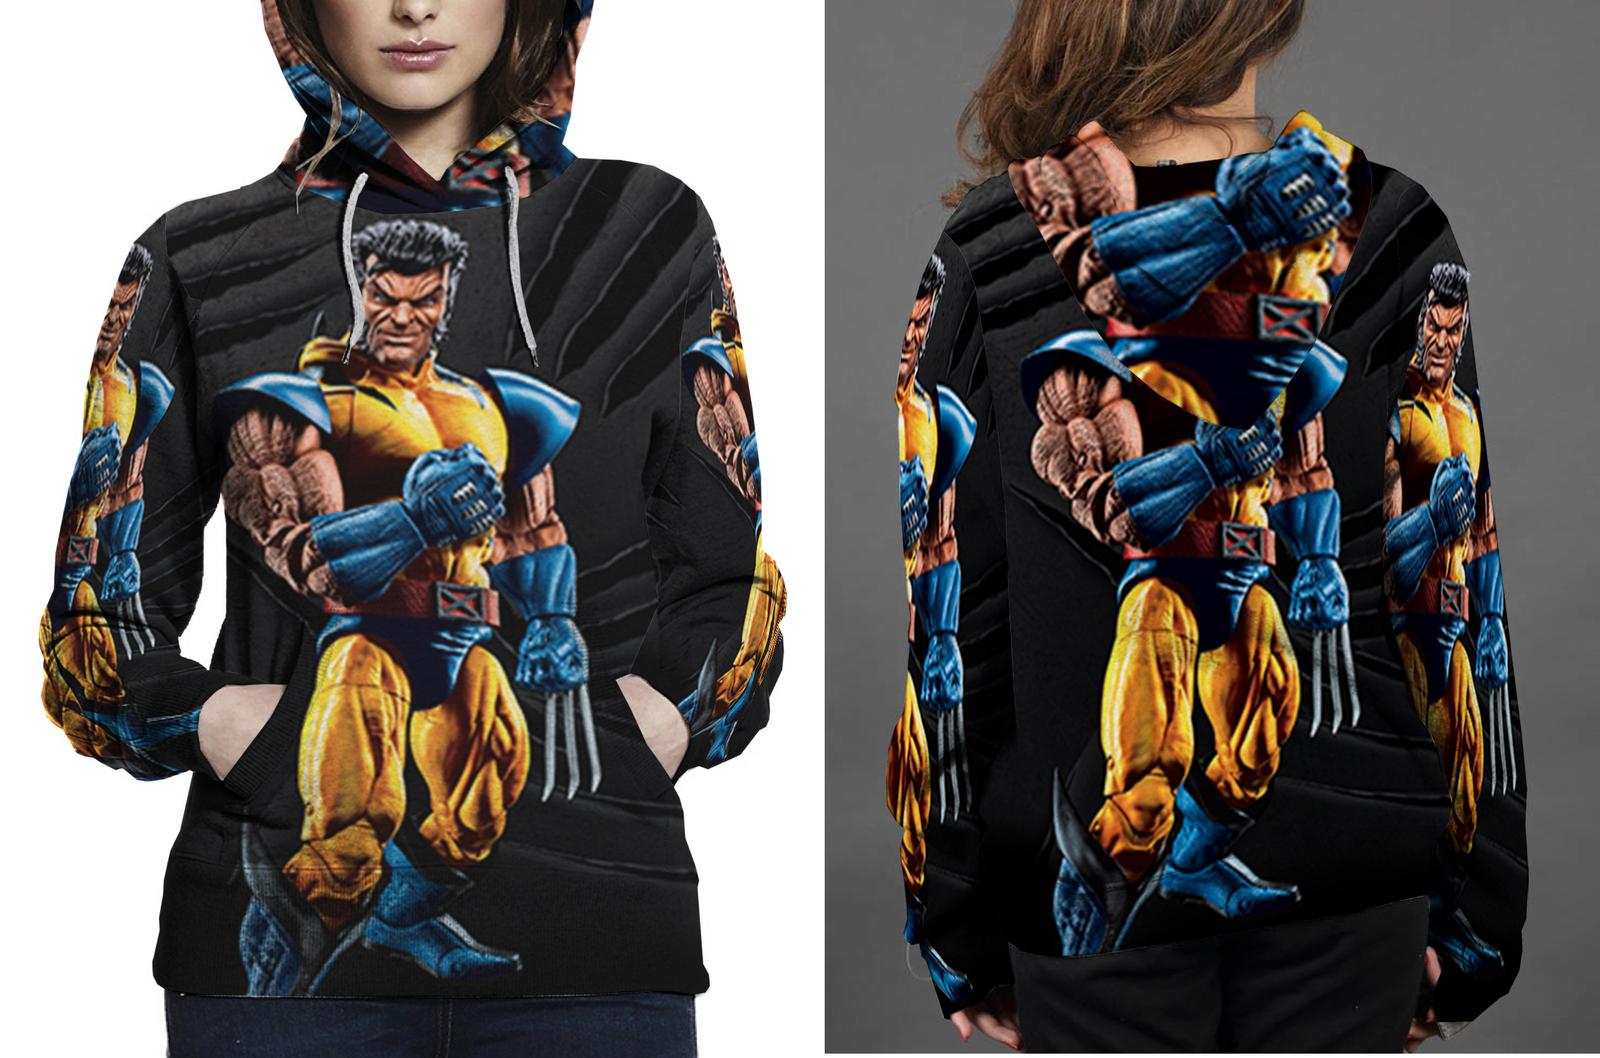 Marvel legends wolverine unmasked figure hoodie women s